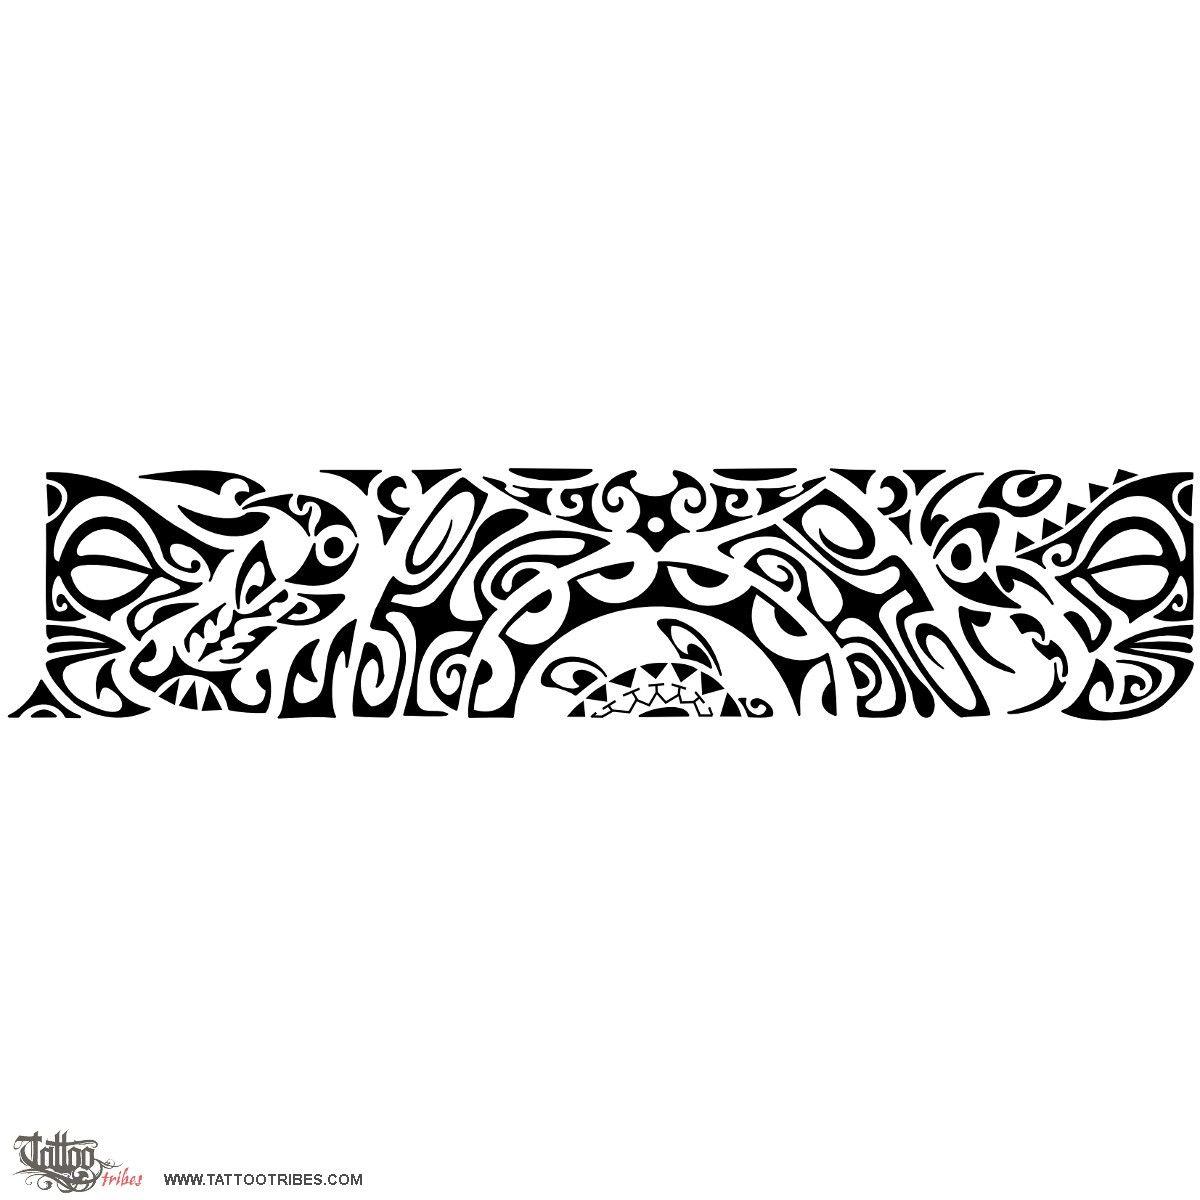 Super Tatuaggio di Mahurutanga, Serenità tattoo - TattooTribes.com  WH71